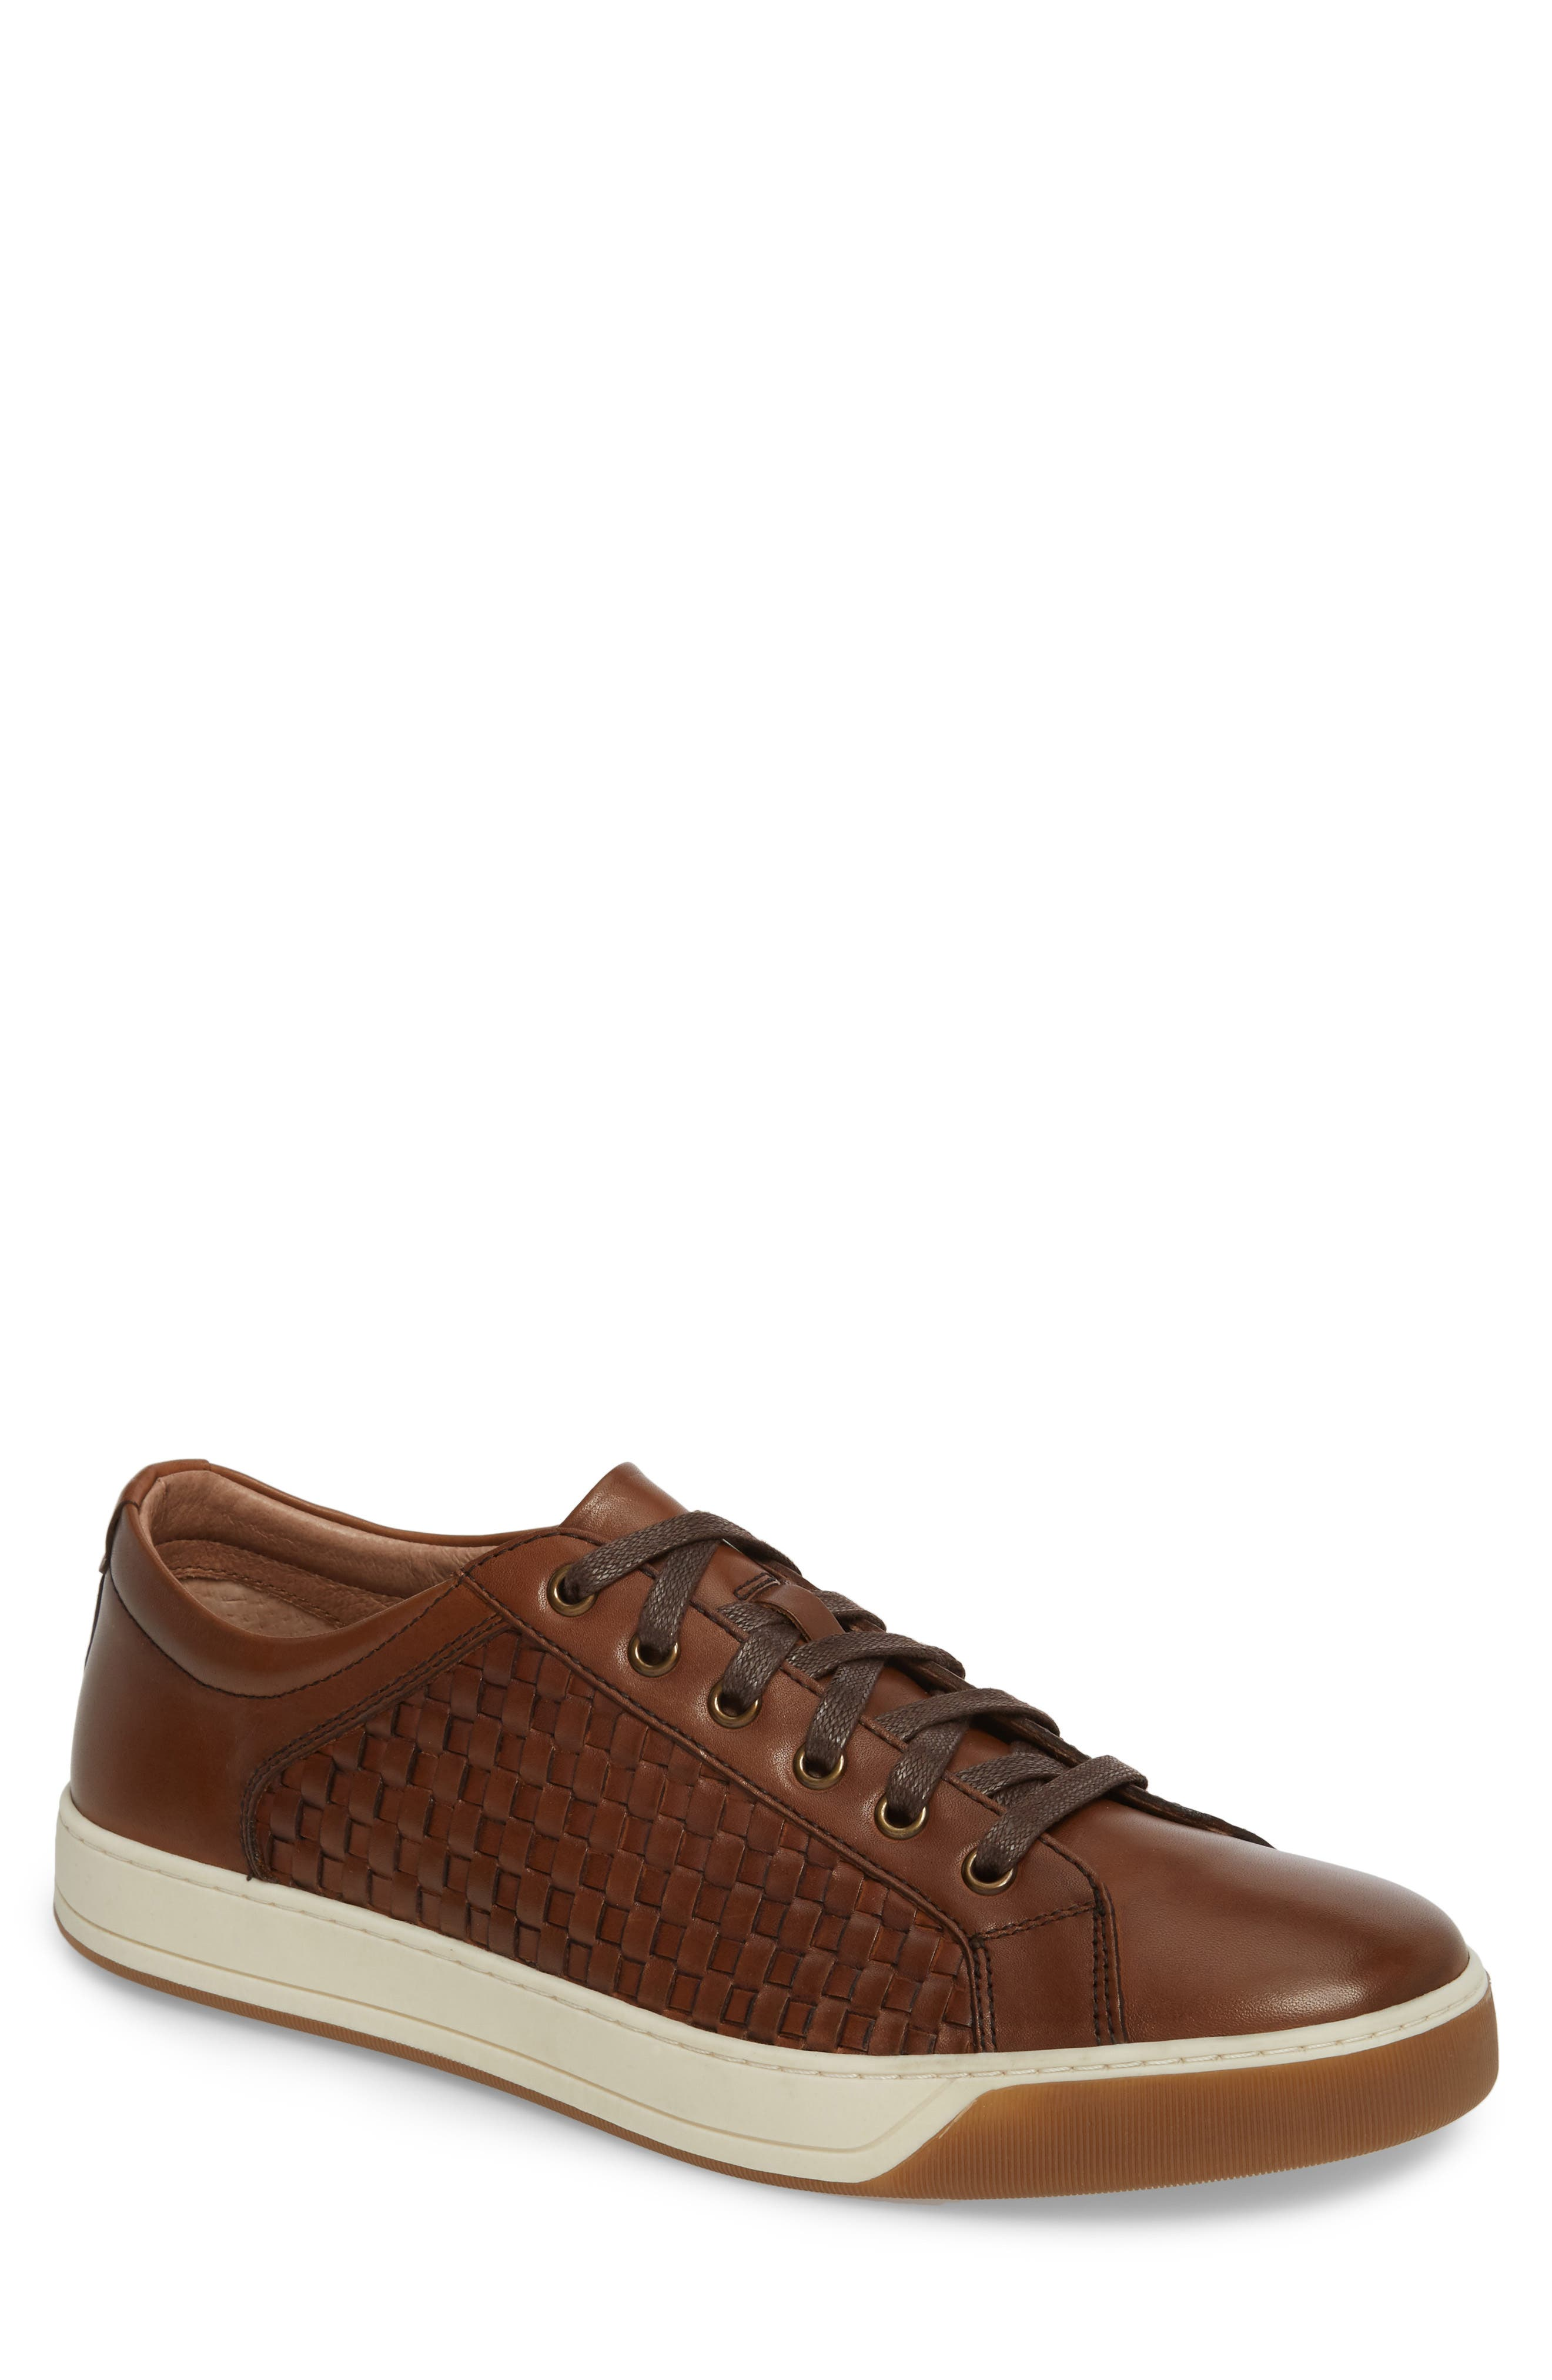 Alternate Image 1 Selected - J&M 1850 Allister Woven Low Top Sneaker (Men)